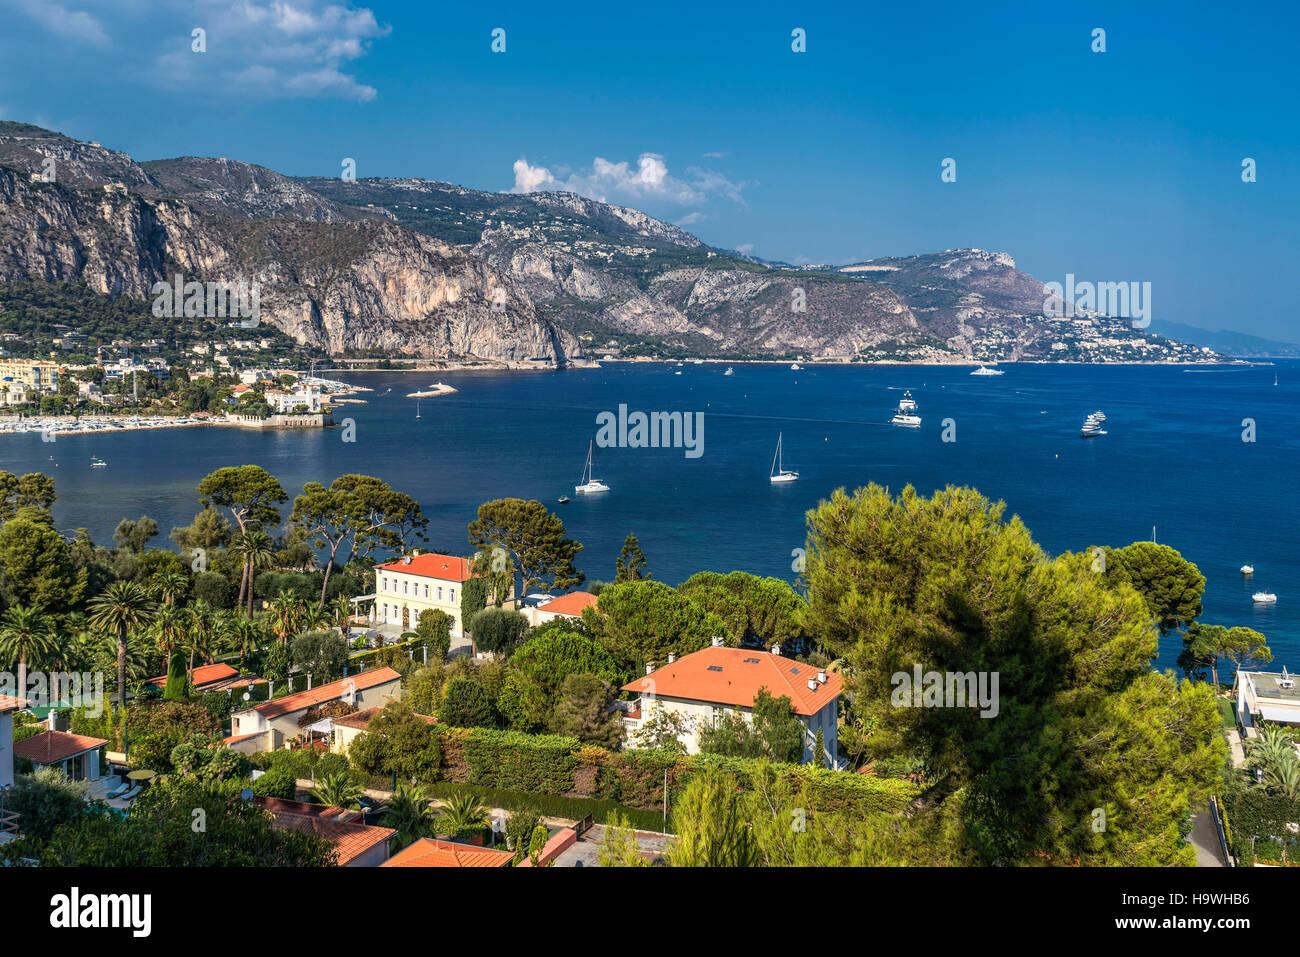 Saint Jean Cap Ferrat, Luxery Villa, Yachts, Meditarrenean Sea,background Villa Grecque Kerylos, Beaulieu Sur Mer, - Stock Image